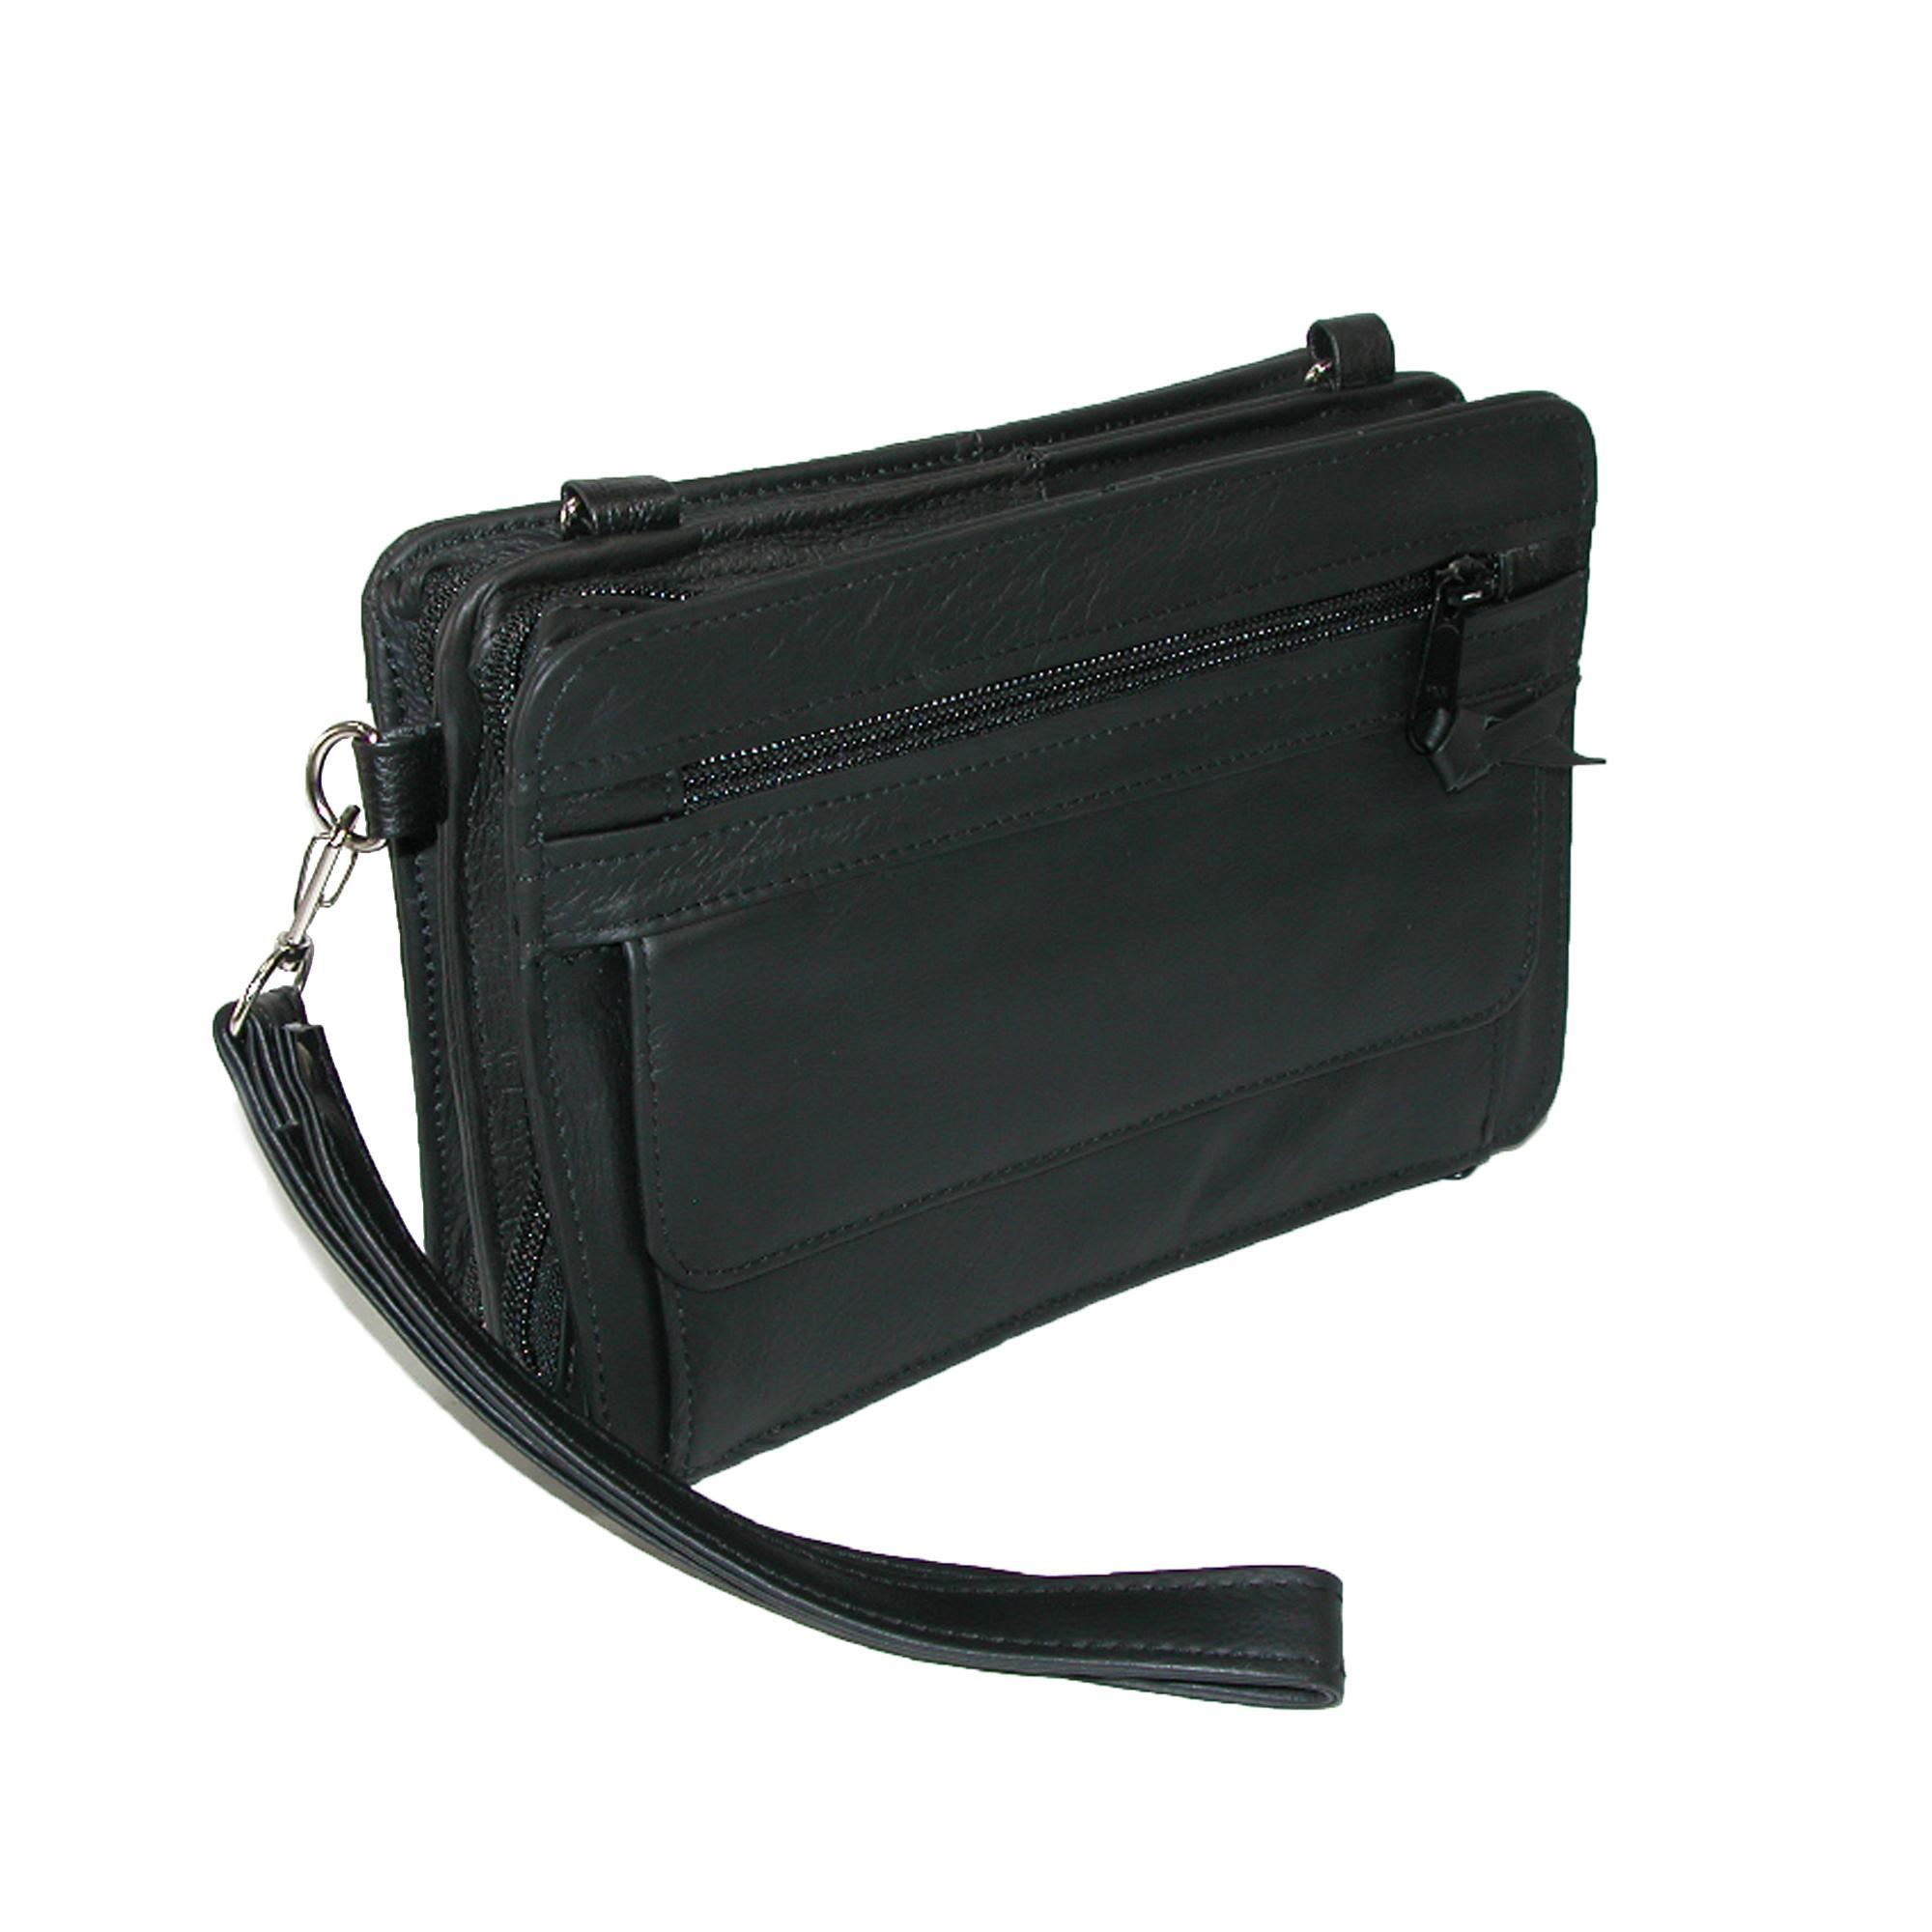 CTM Men's Leather Gun Conceal Carry Waist Pack Bag